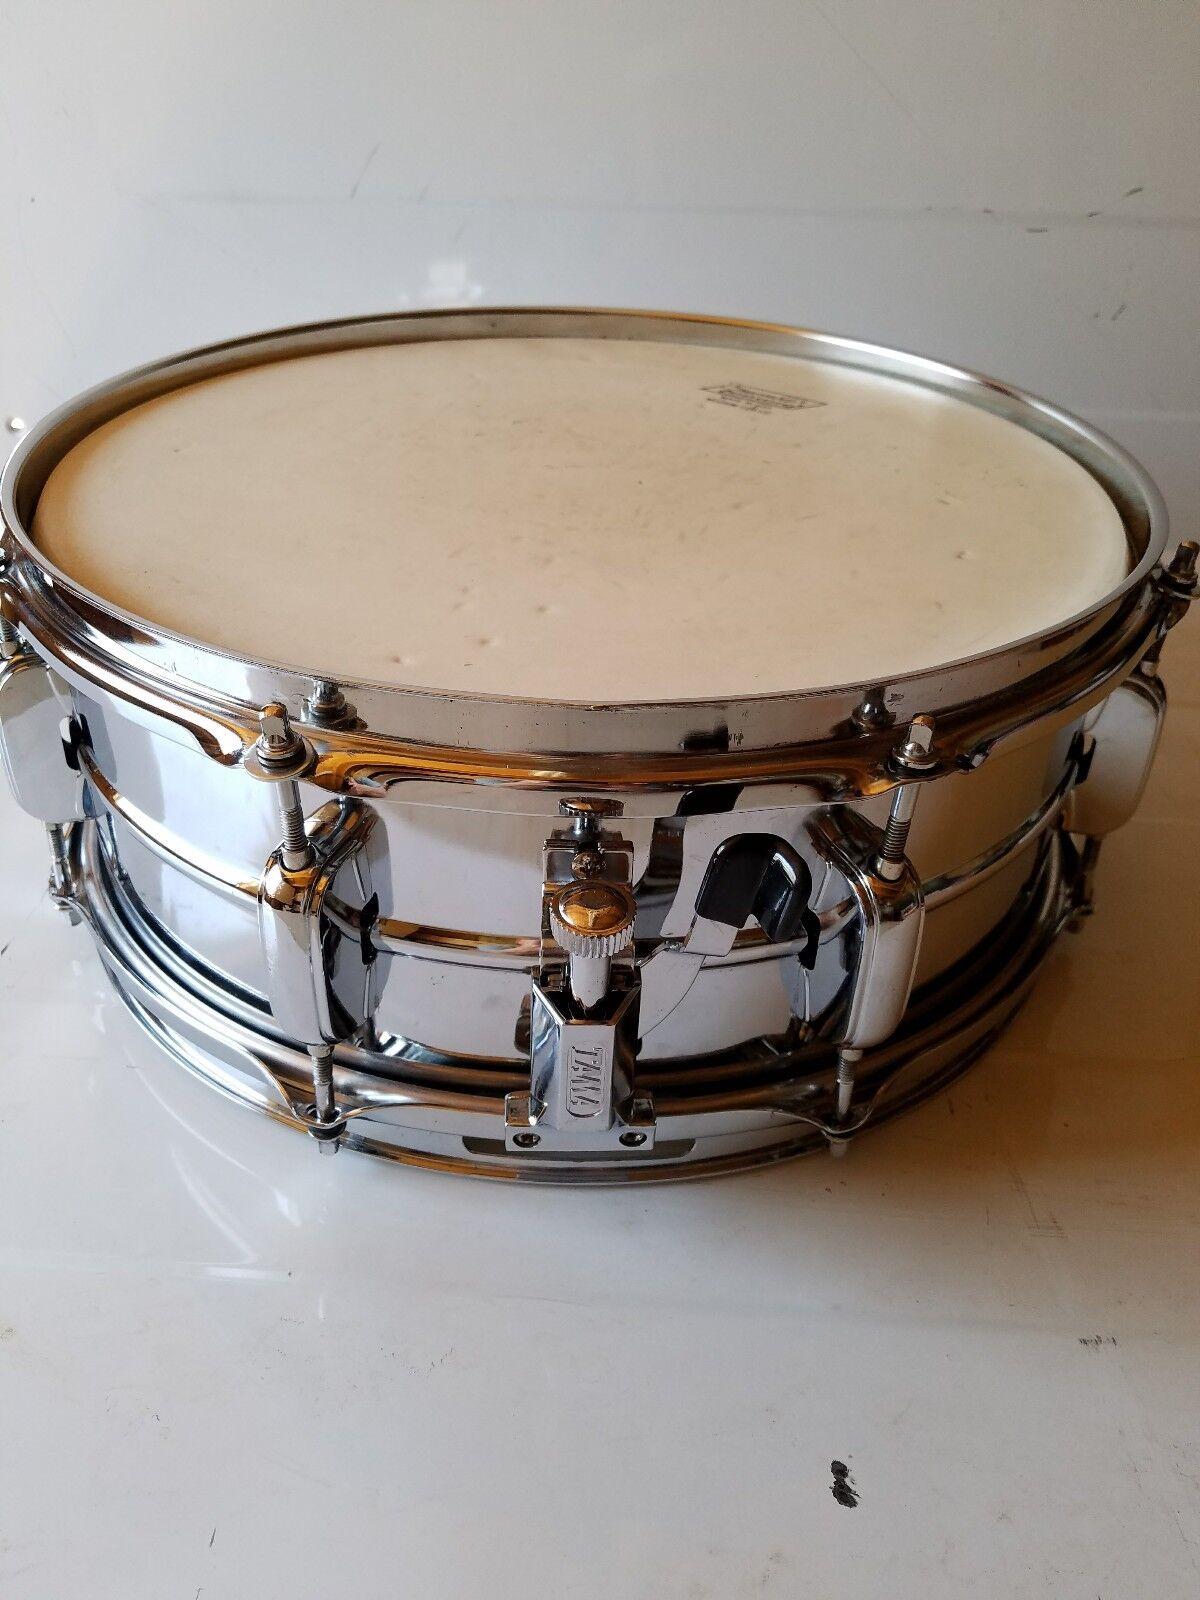 Tama Snare Drum - Swingstar